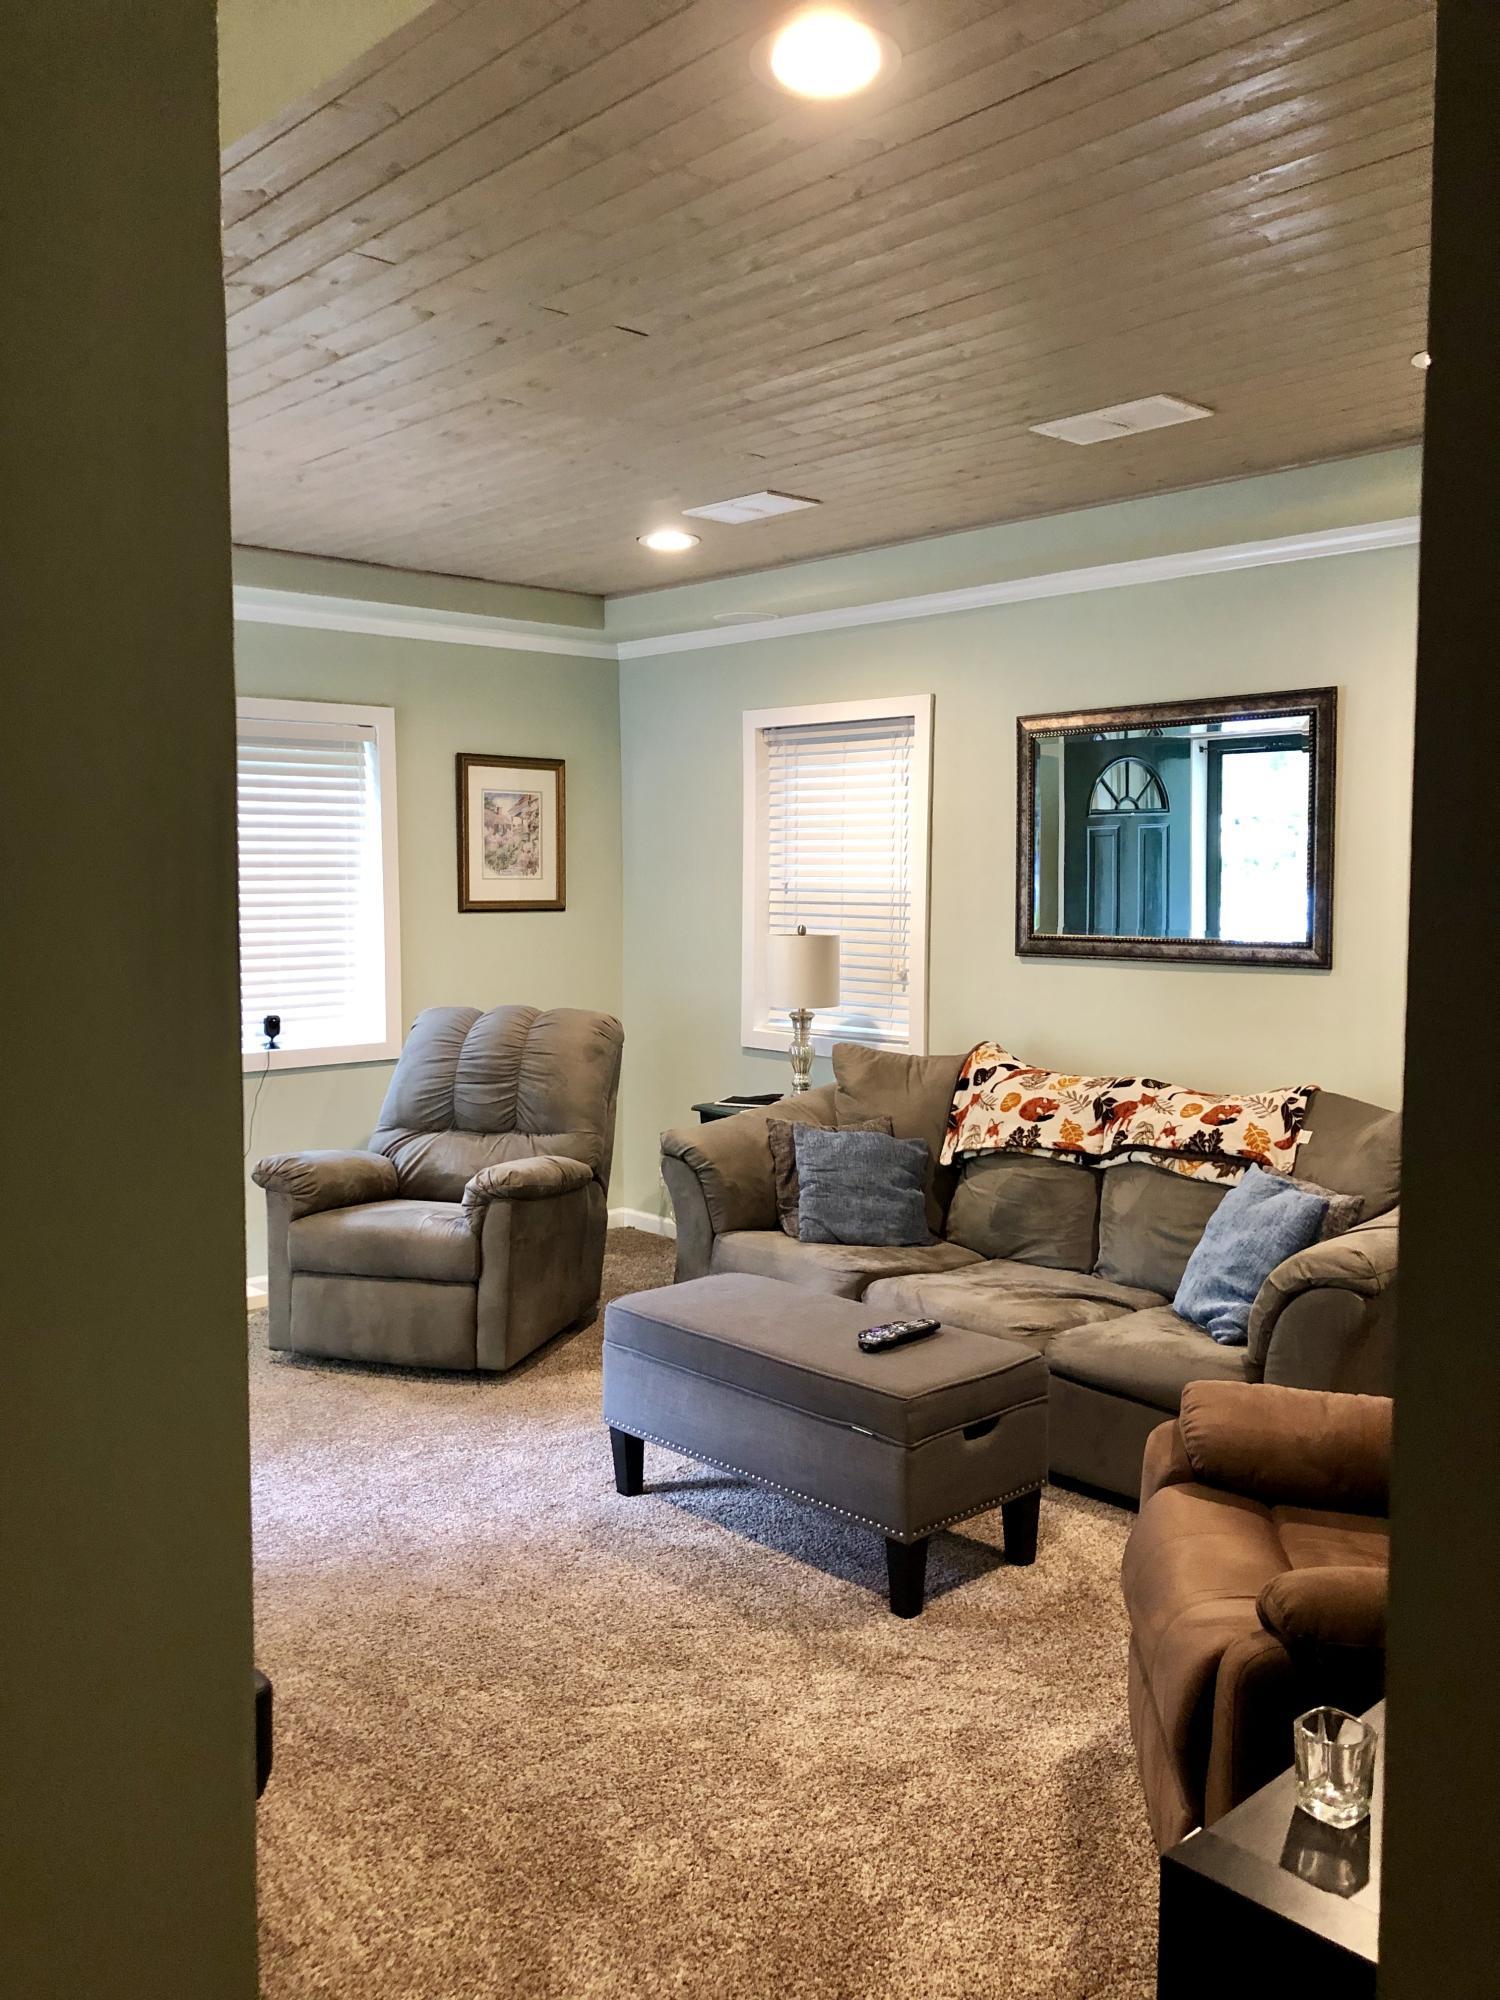 Pinecrest Gardens Homes For Sale - 1715 Jessamine, Charleston, SC - 12